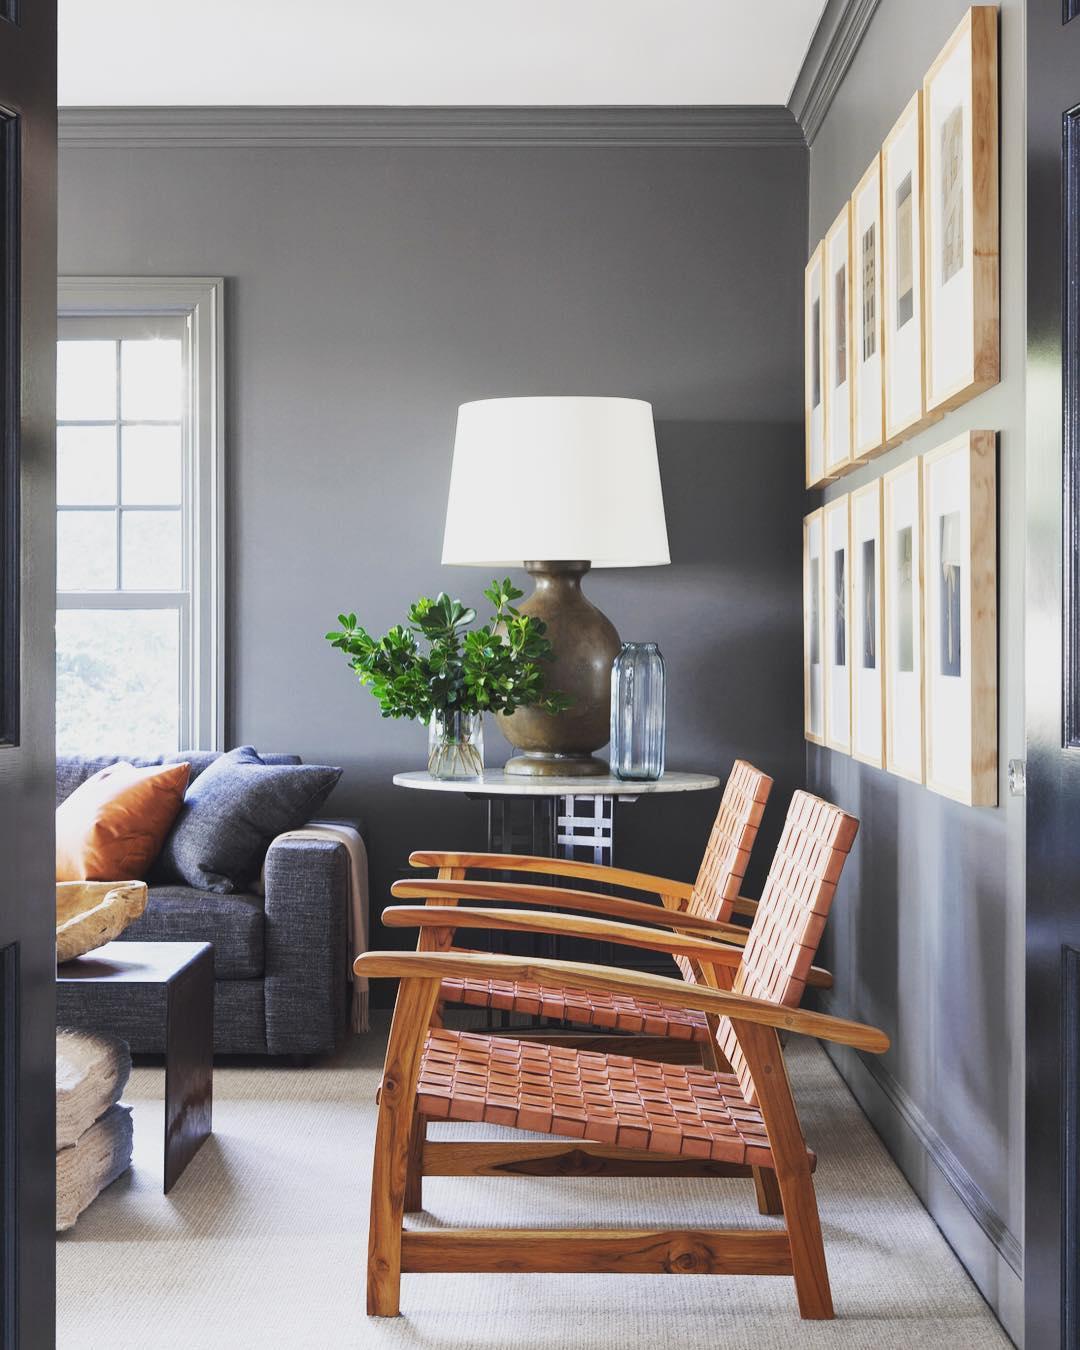 Benjamin Moore Kendall Charcoal living room